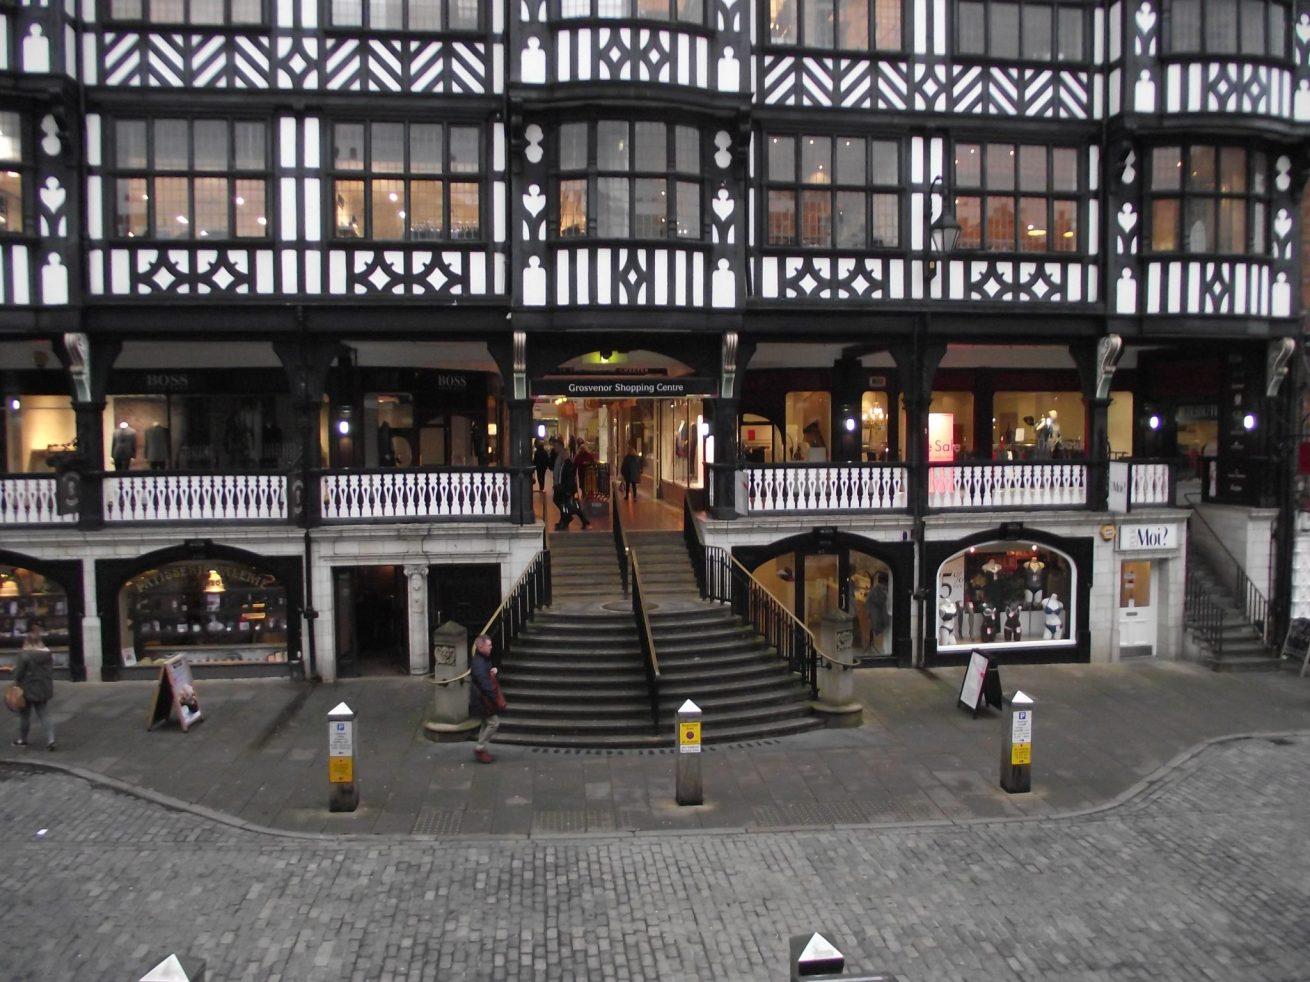 Grosvenor Shopping Centre